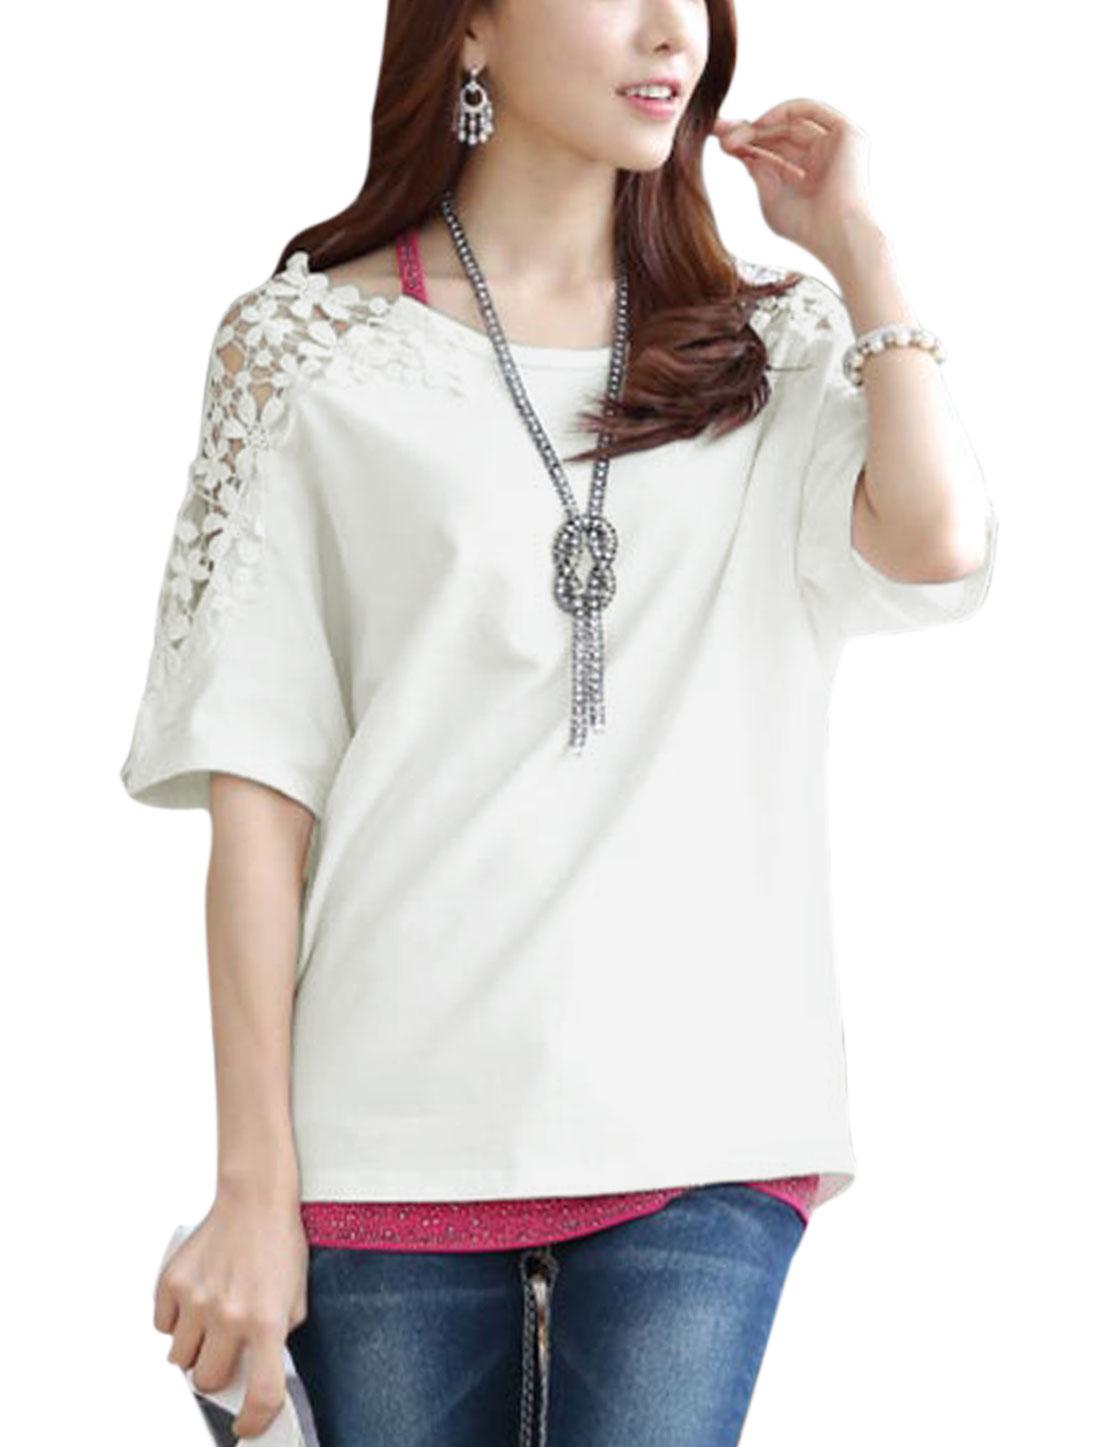 Women Scoop Neck Elbow Dolman Sleeves Crochet Tops White XS